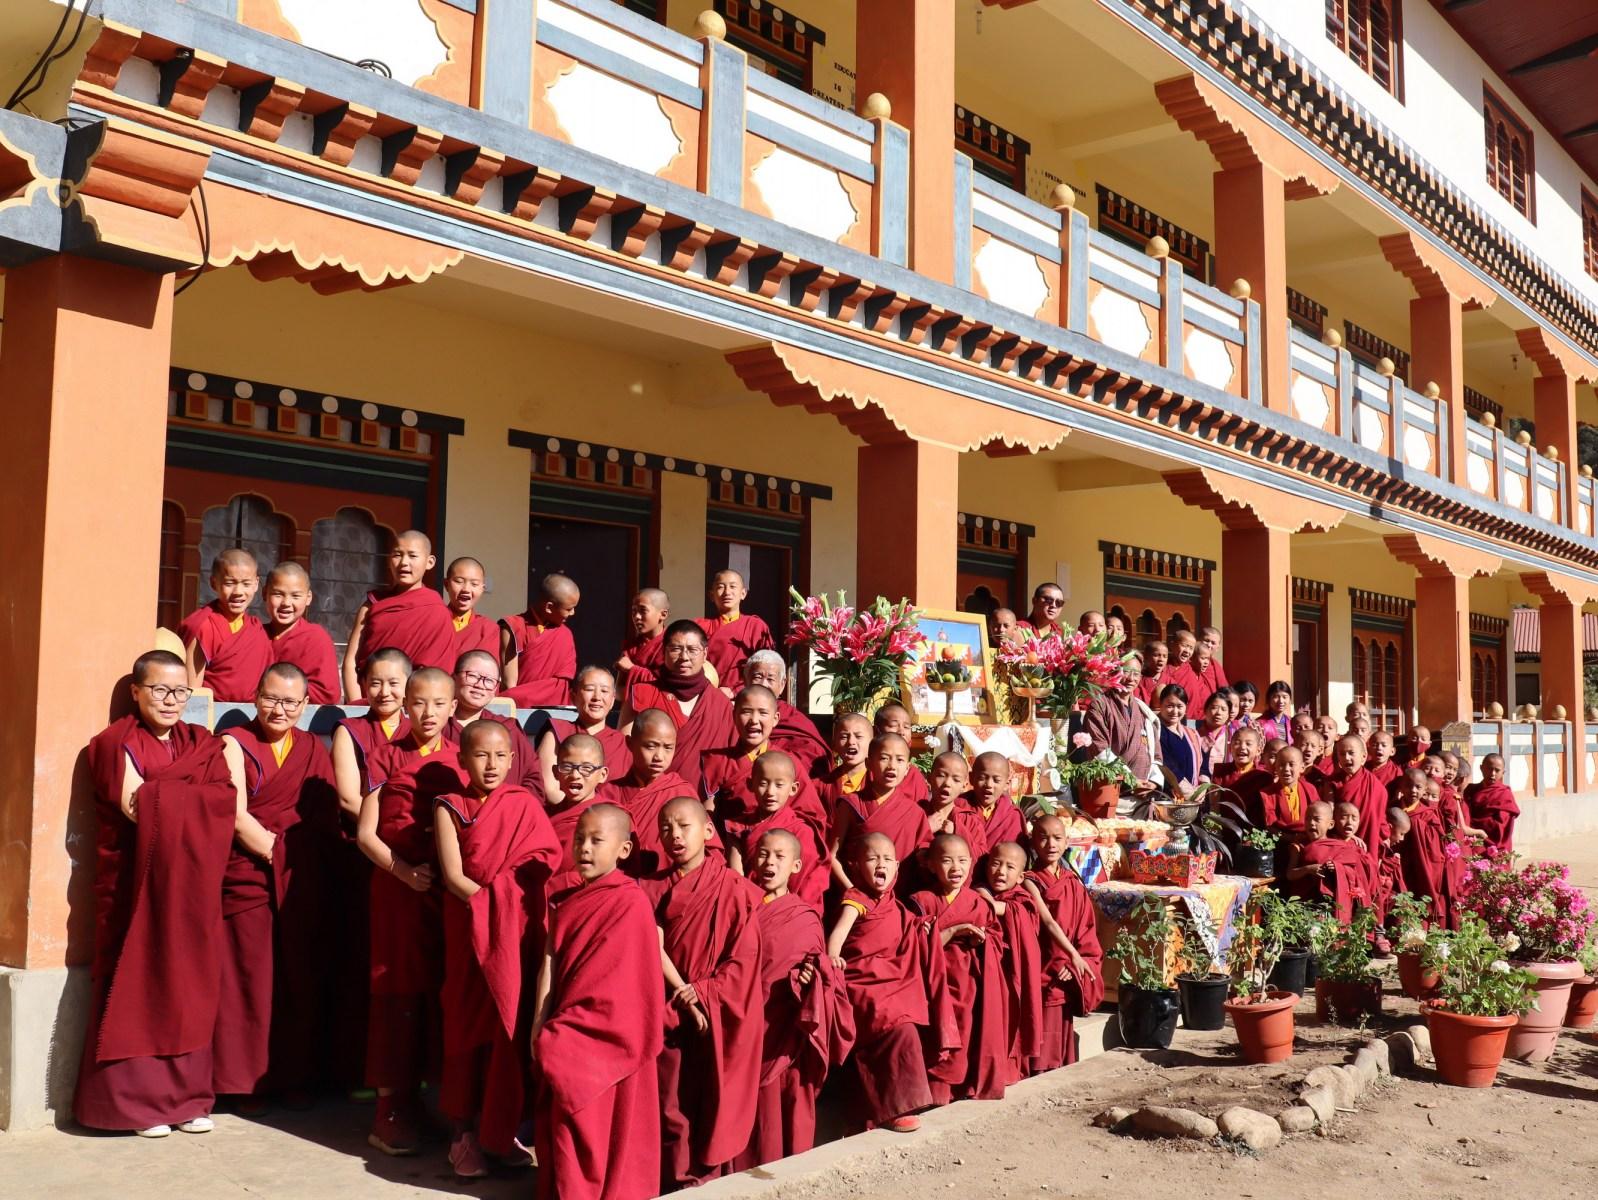 113-National-day-of-Bhutan-48